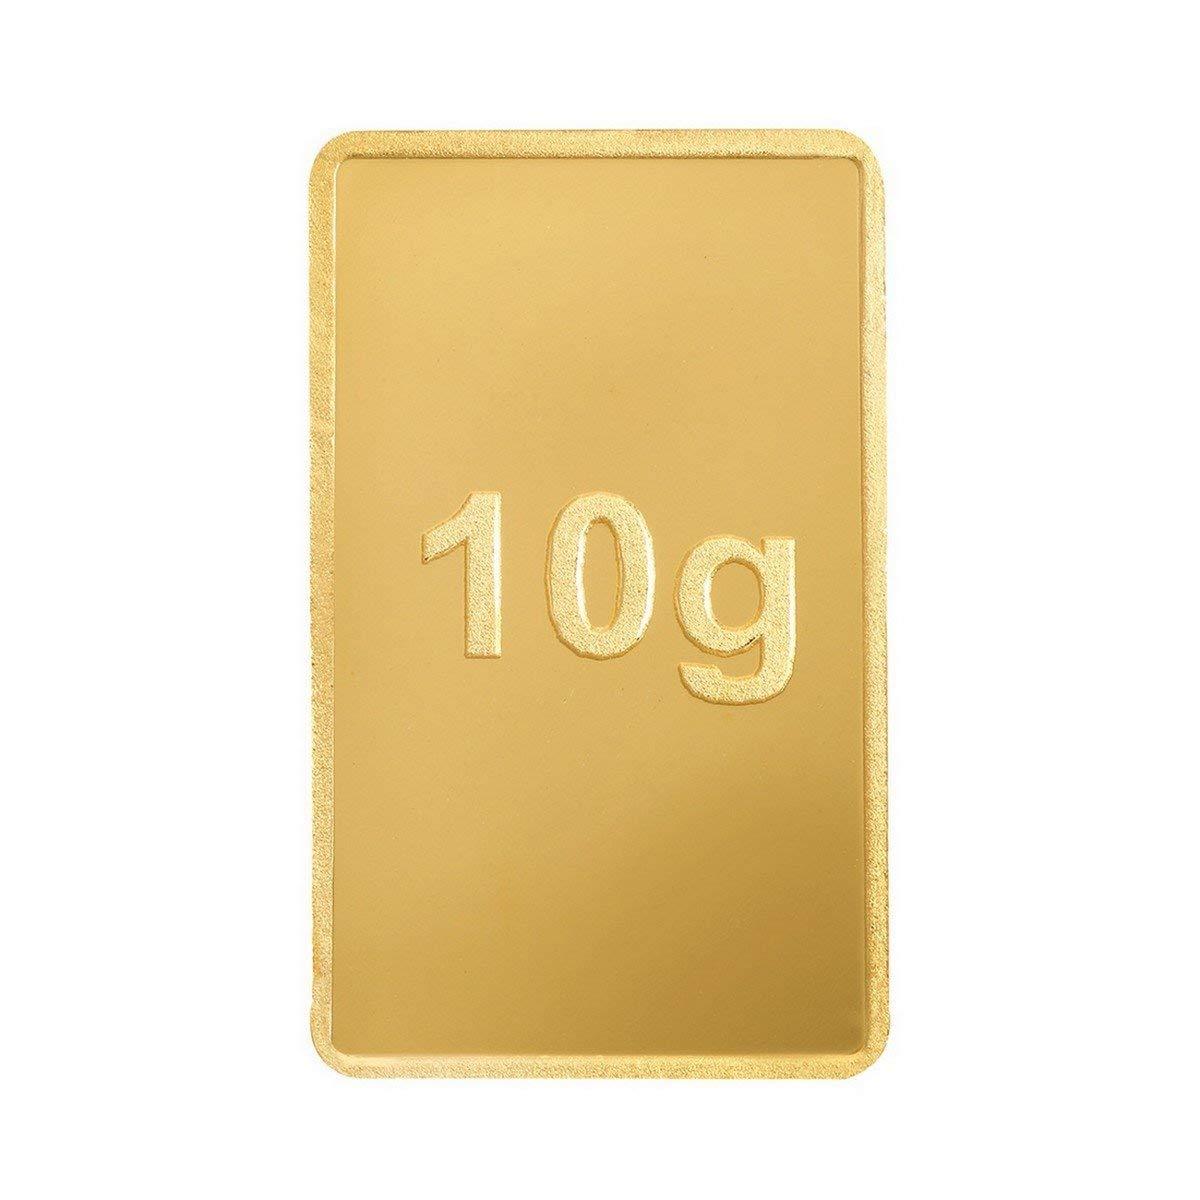 BRPL gold 10 gms 2